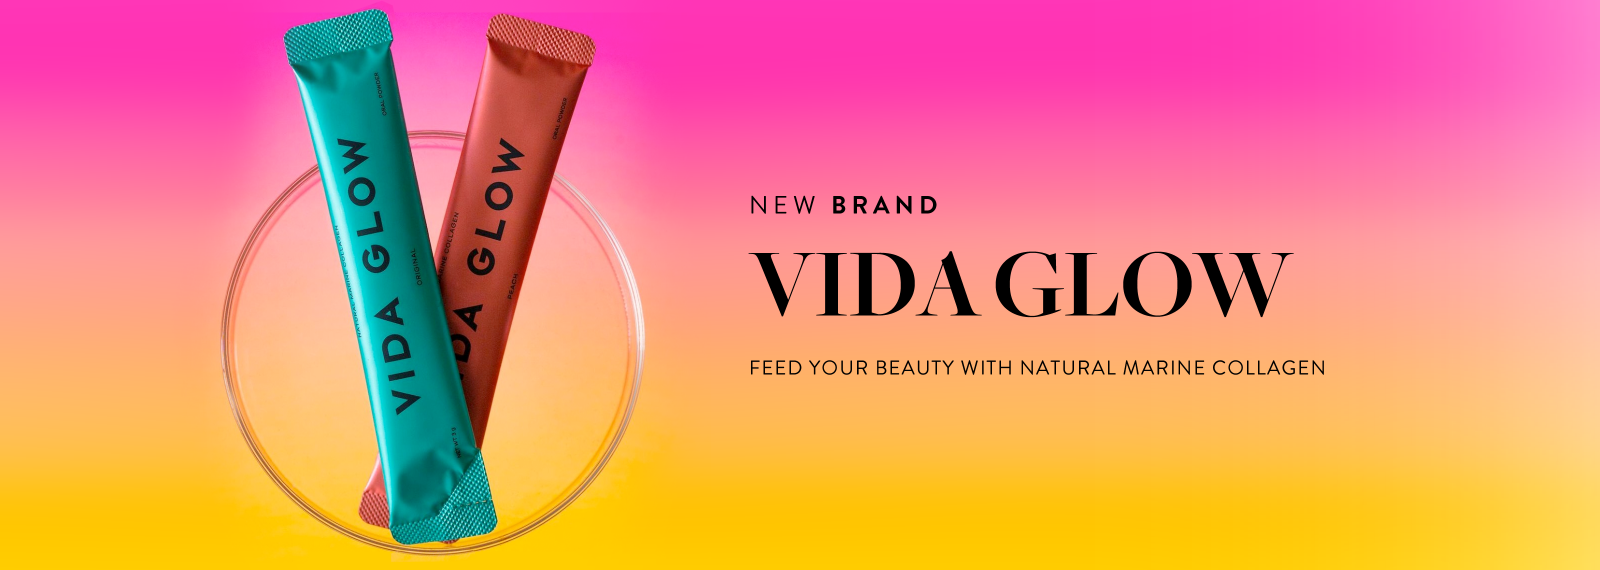 New Brand - VIDA GLOW